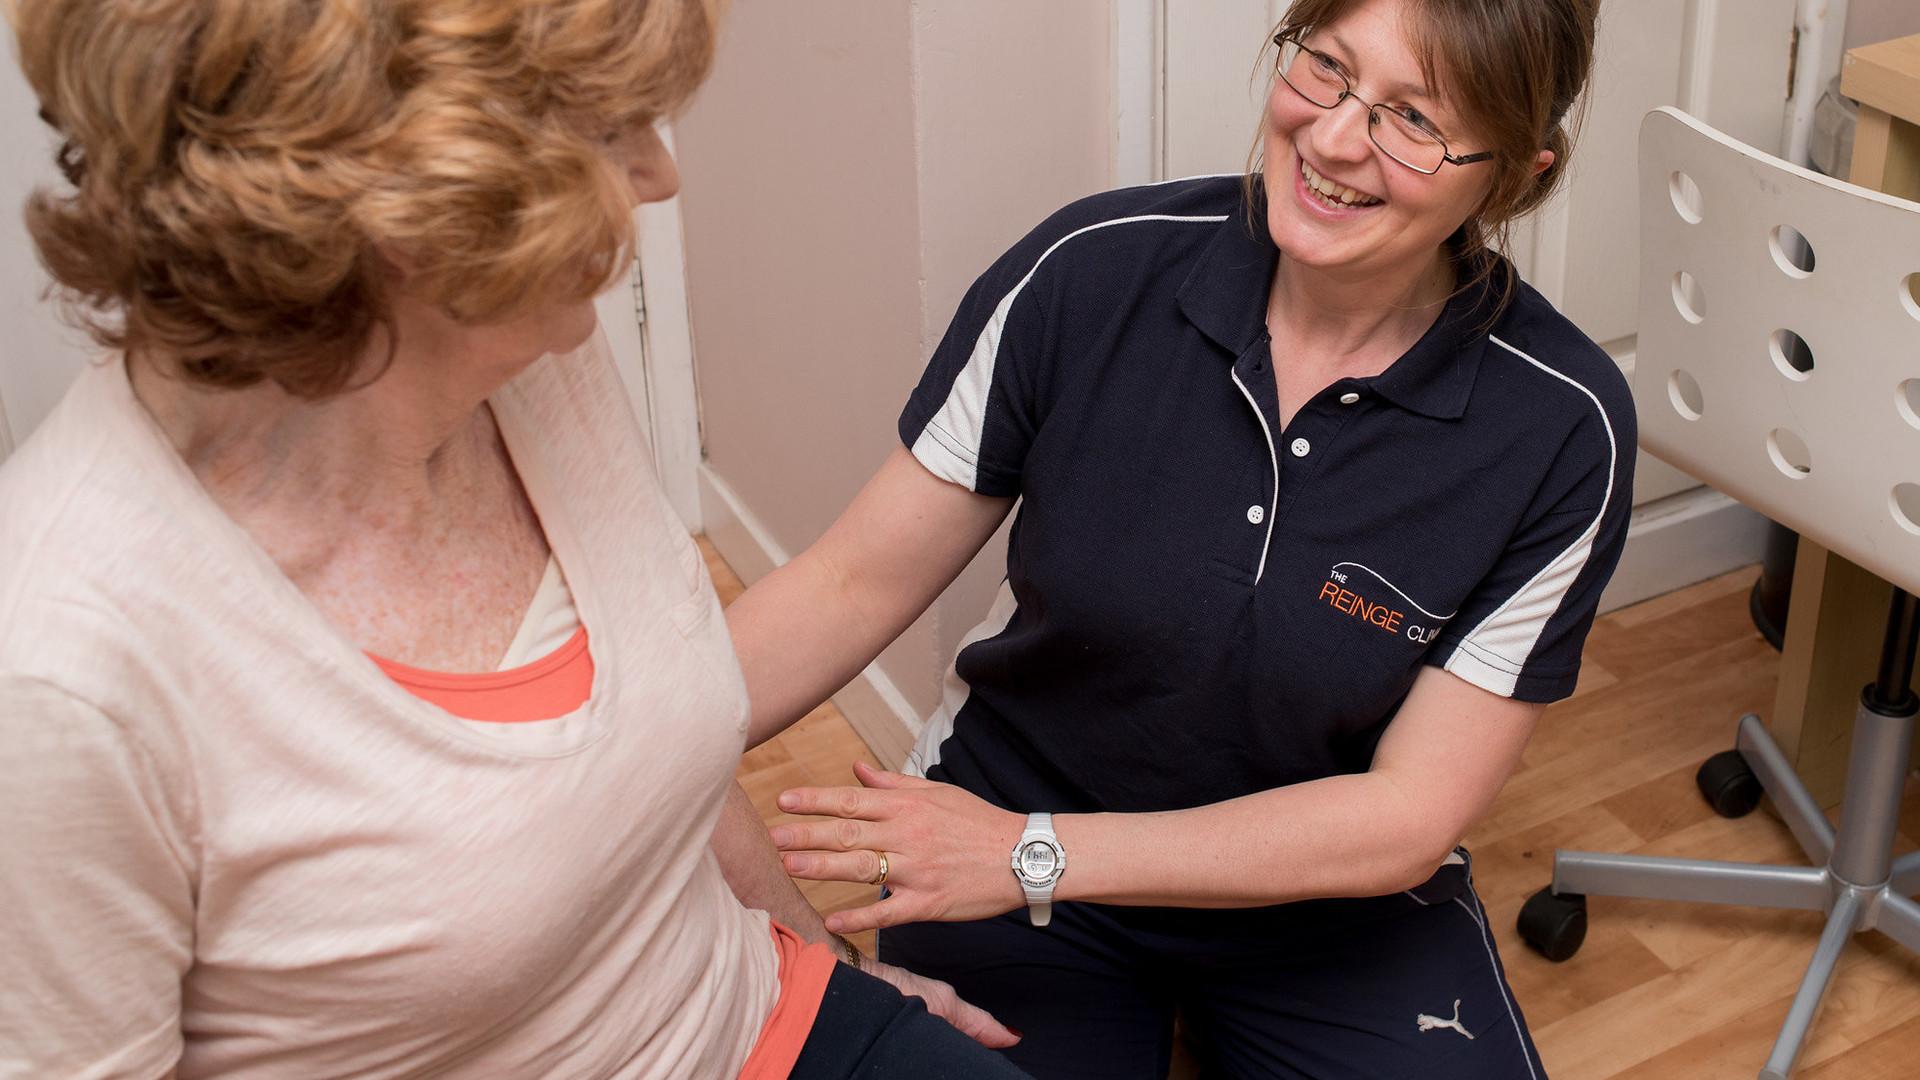 Sports Massage at The Reinge Clinic Kenilworth, Portishead.